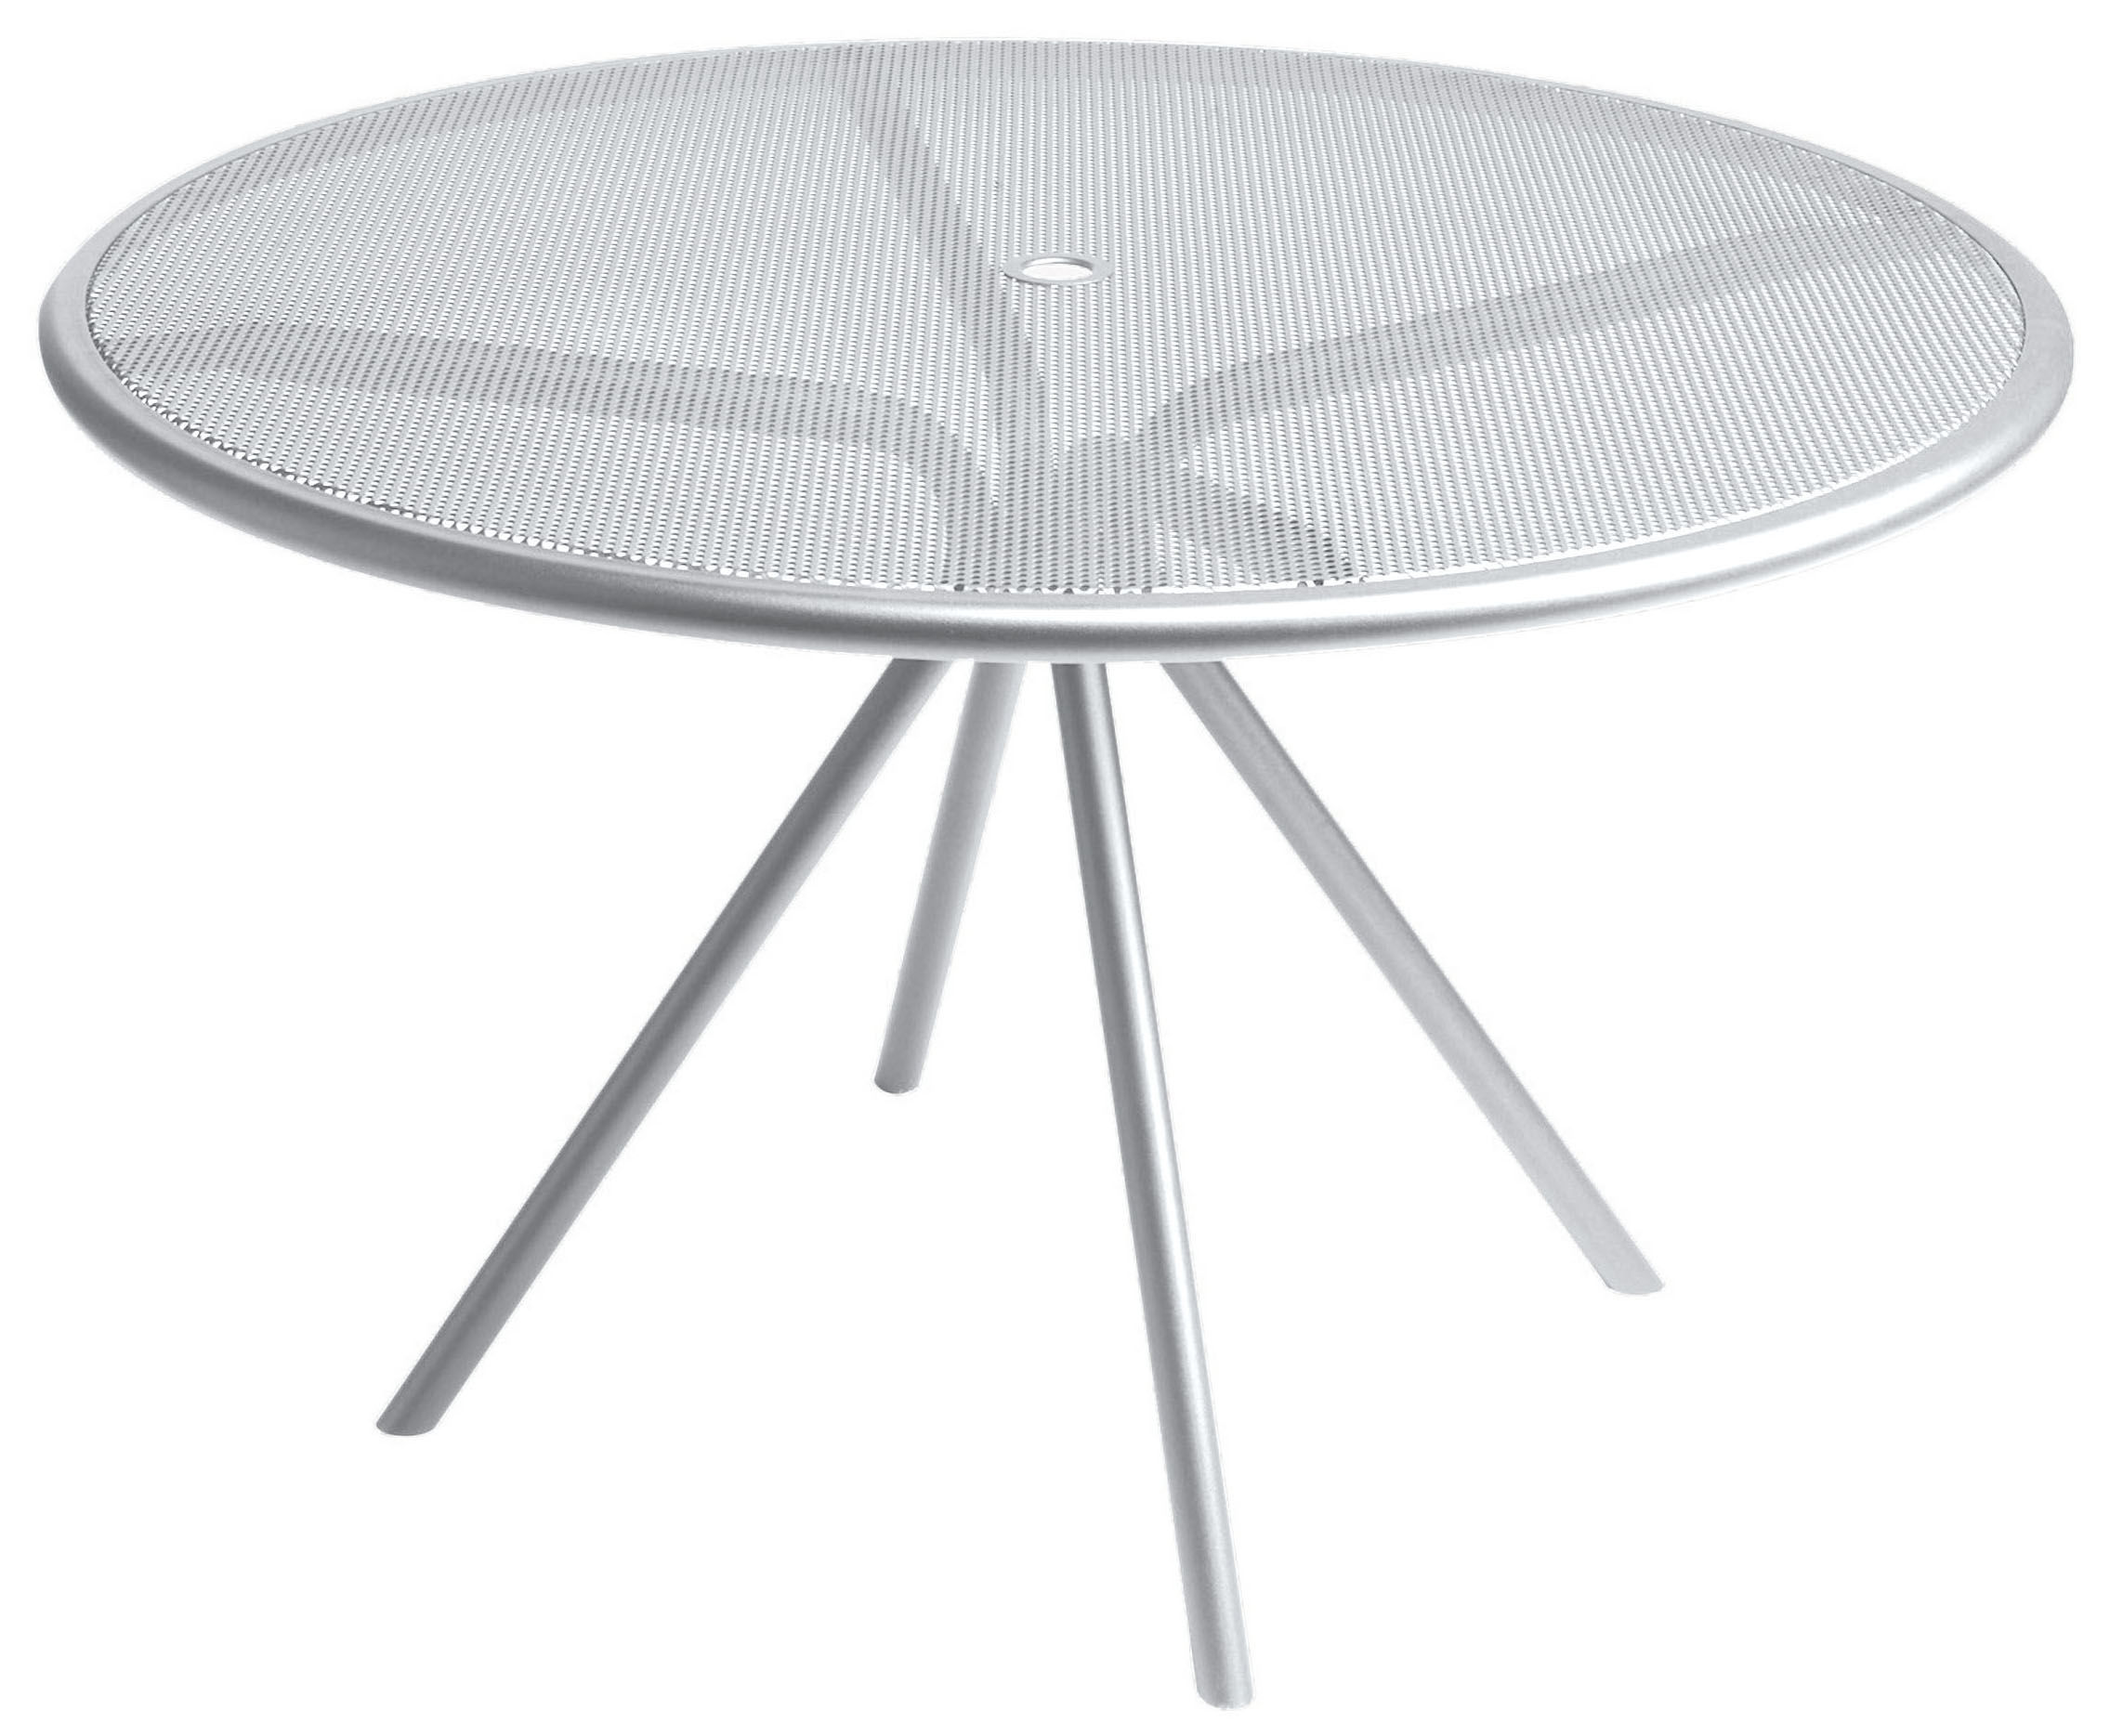 Table ronde Solid / Ø 122 cm - Emu